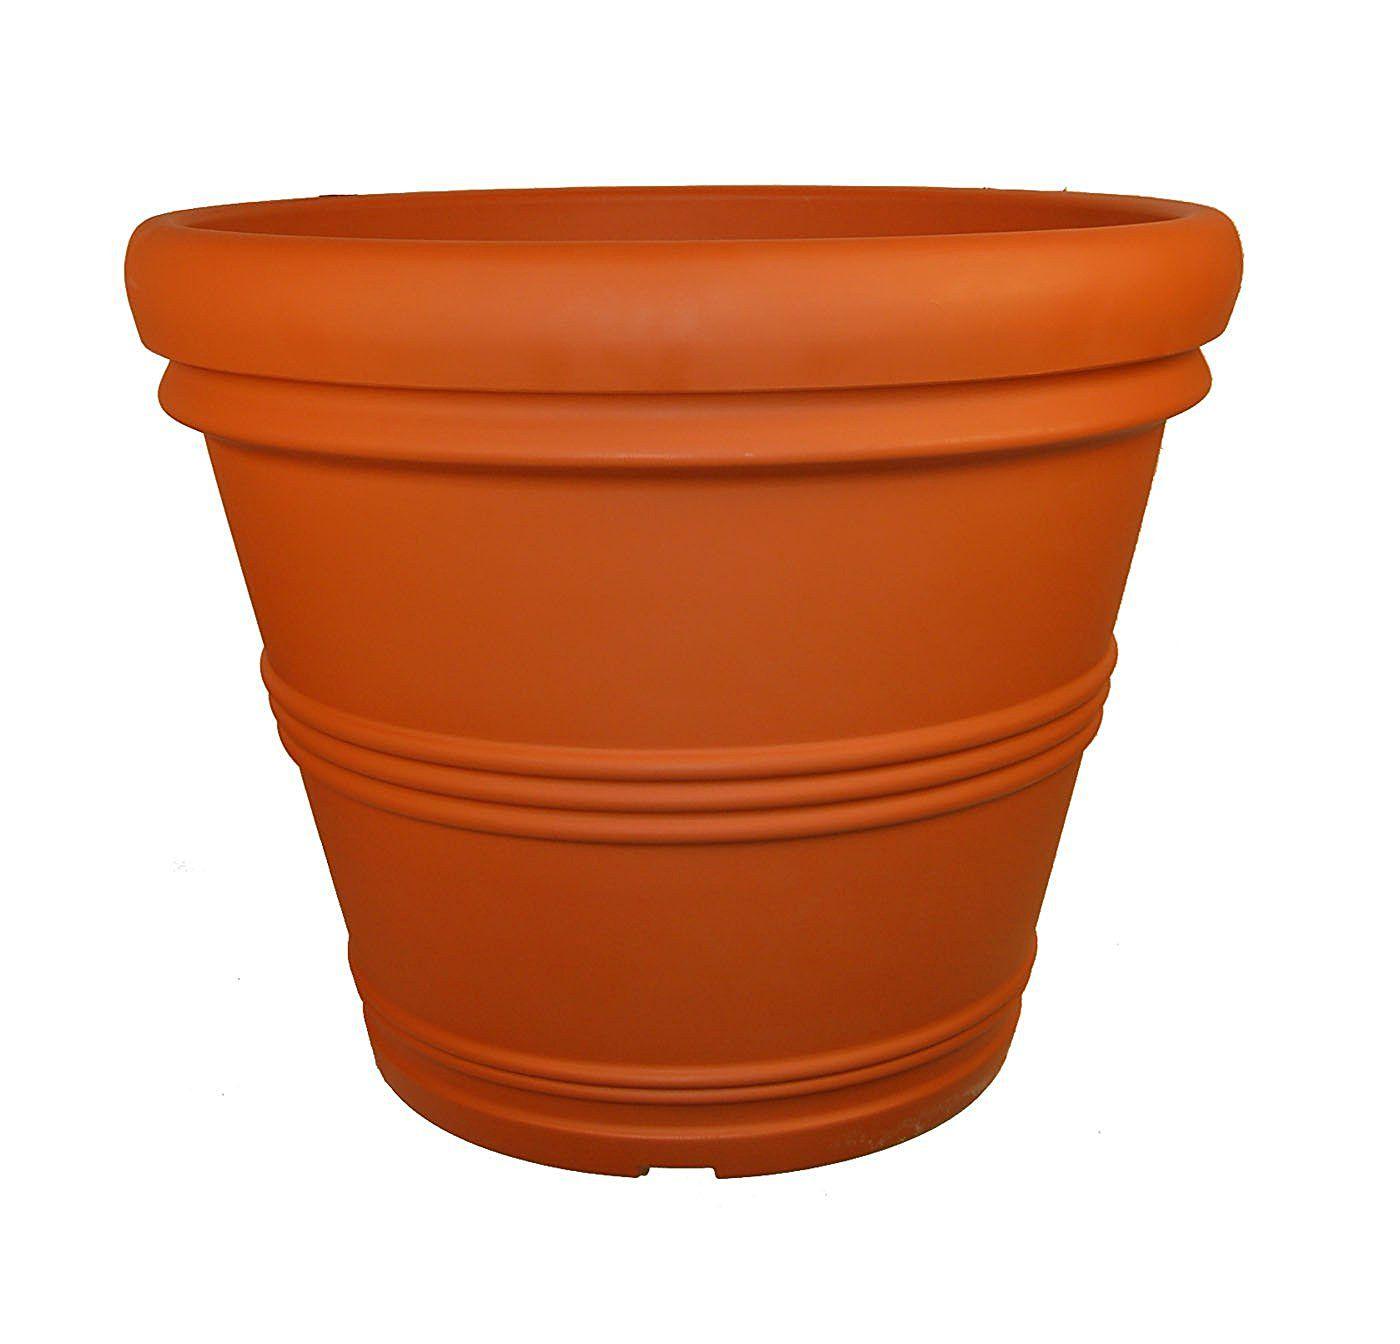 Tusco Products T30 Rolled Rim Pot, Round, Terra Cotta, 30-Inch